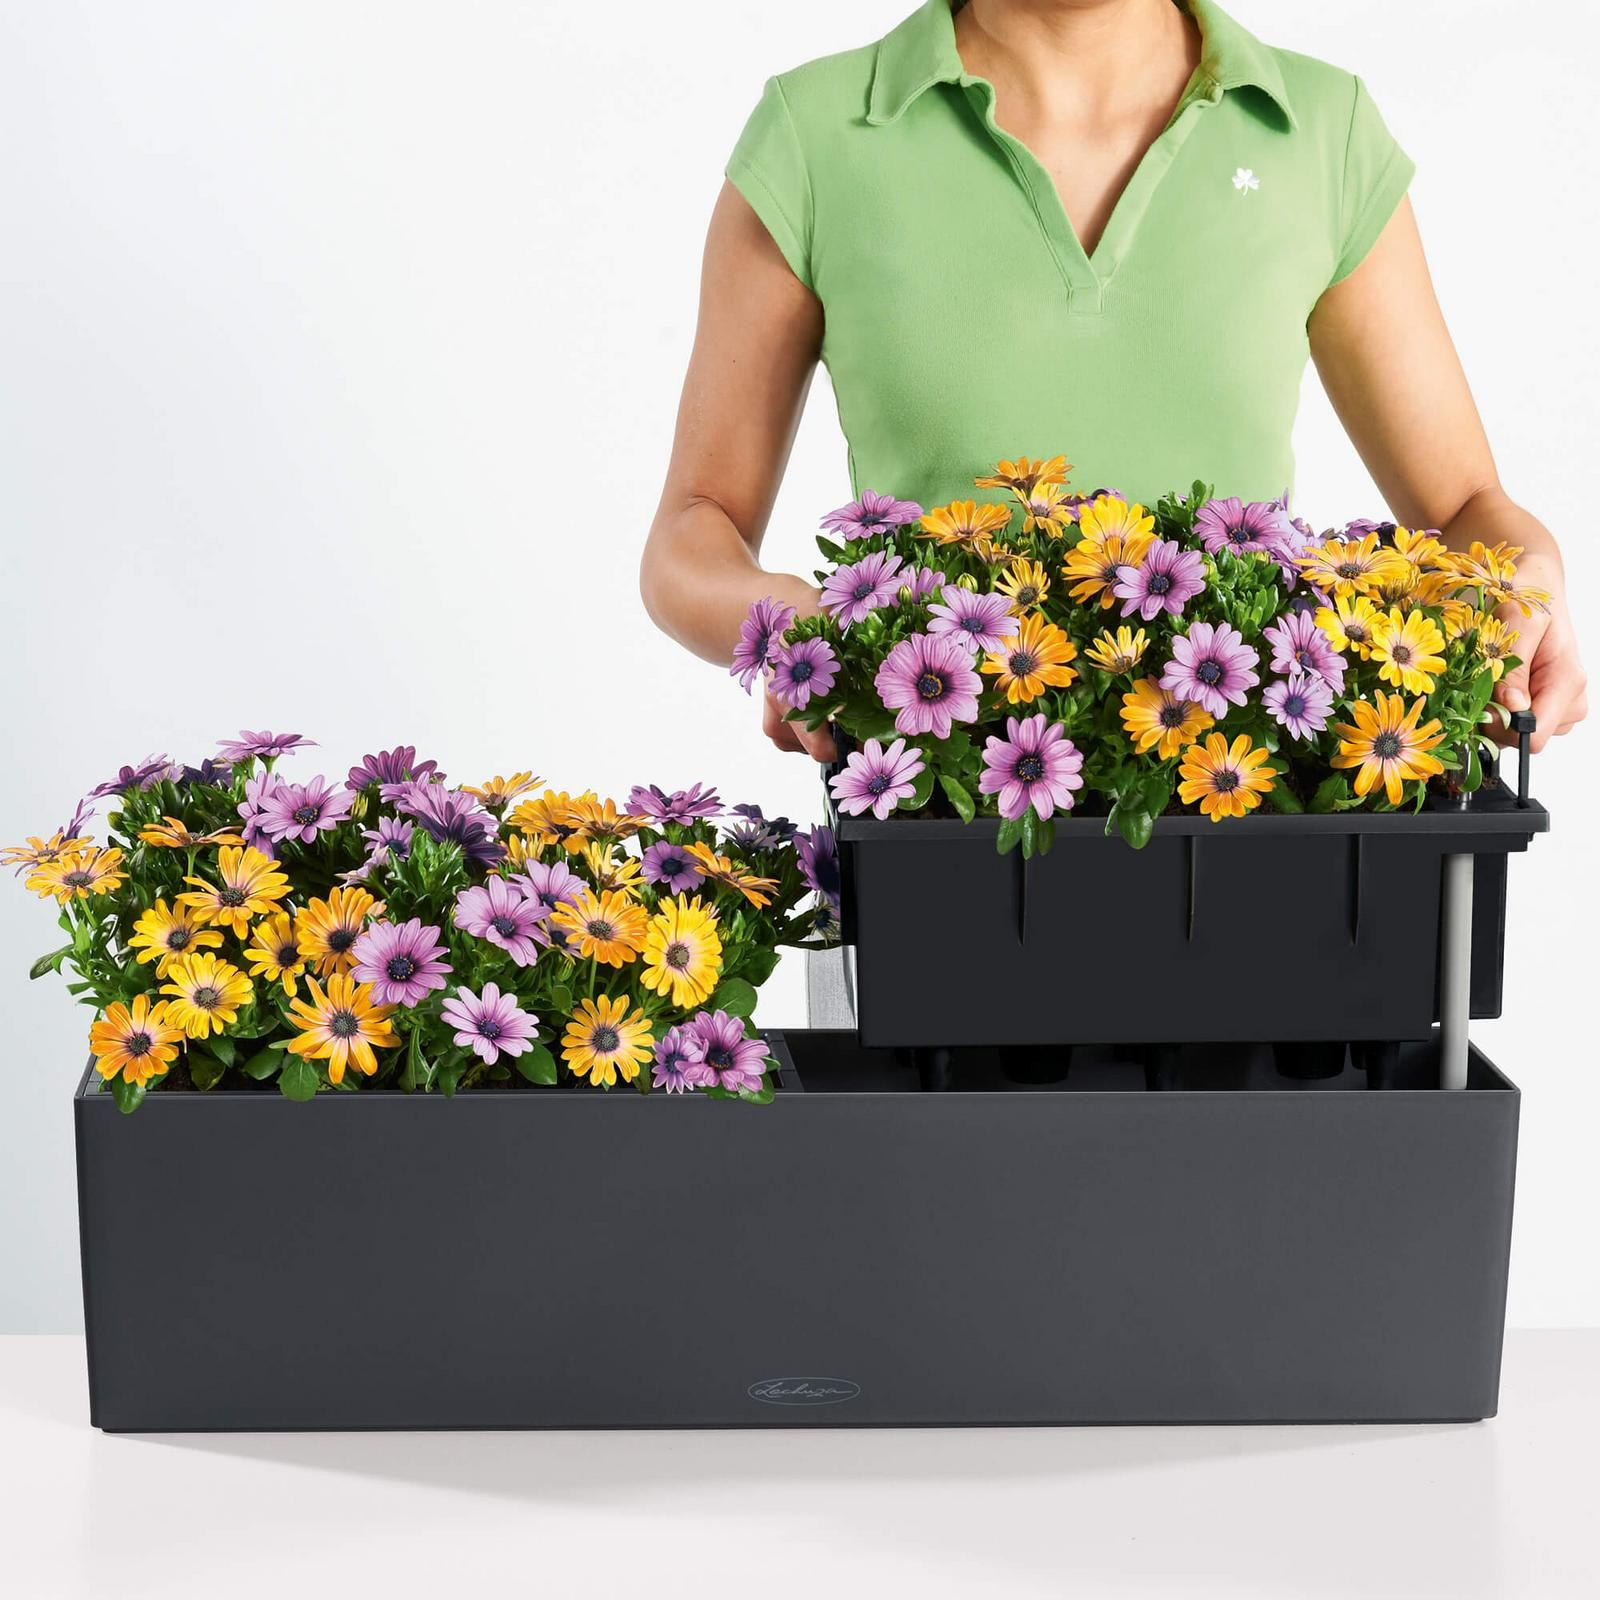 Lechuza Balconera Color 80 Komplettset Schiefergrau In 2020 Pflanzideen Pflanzen Balkonkasten